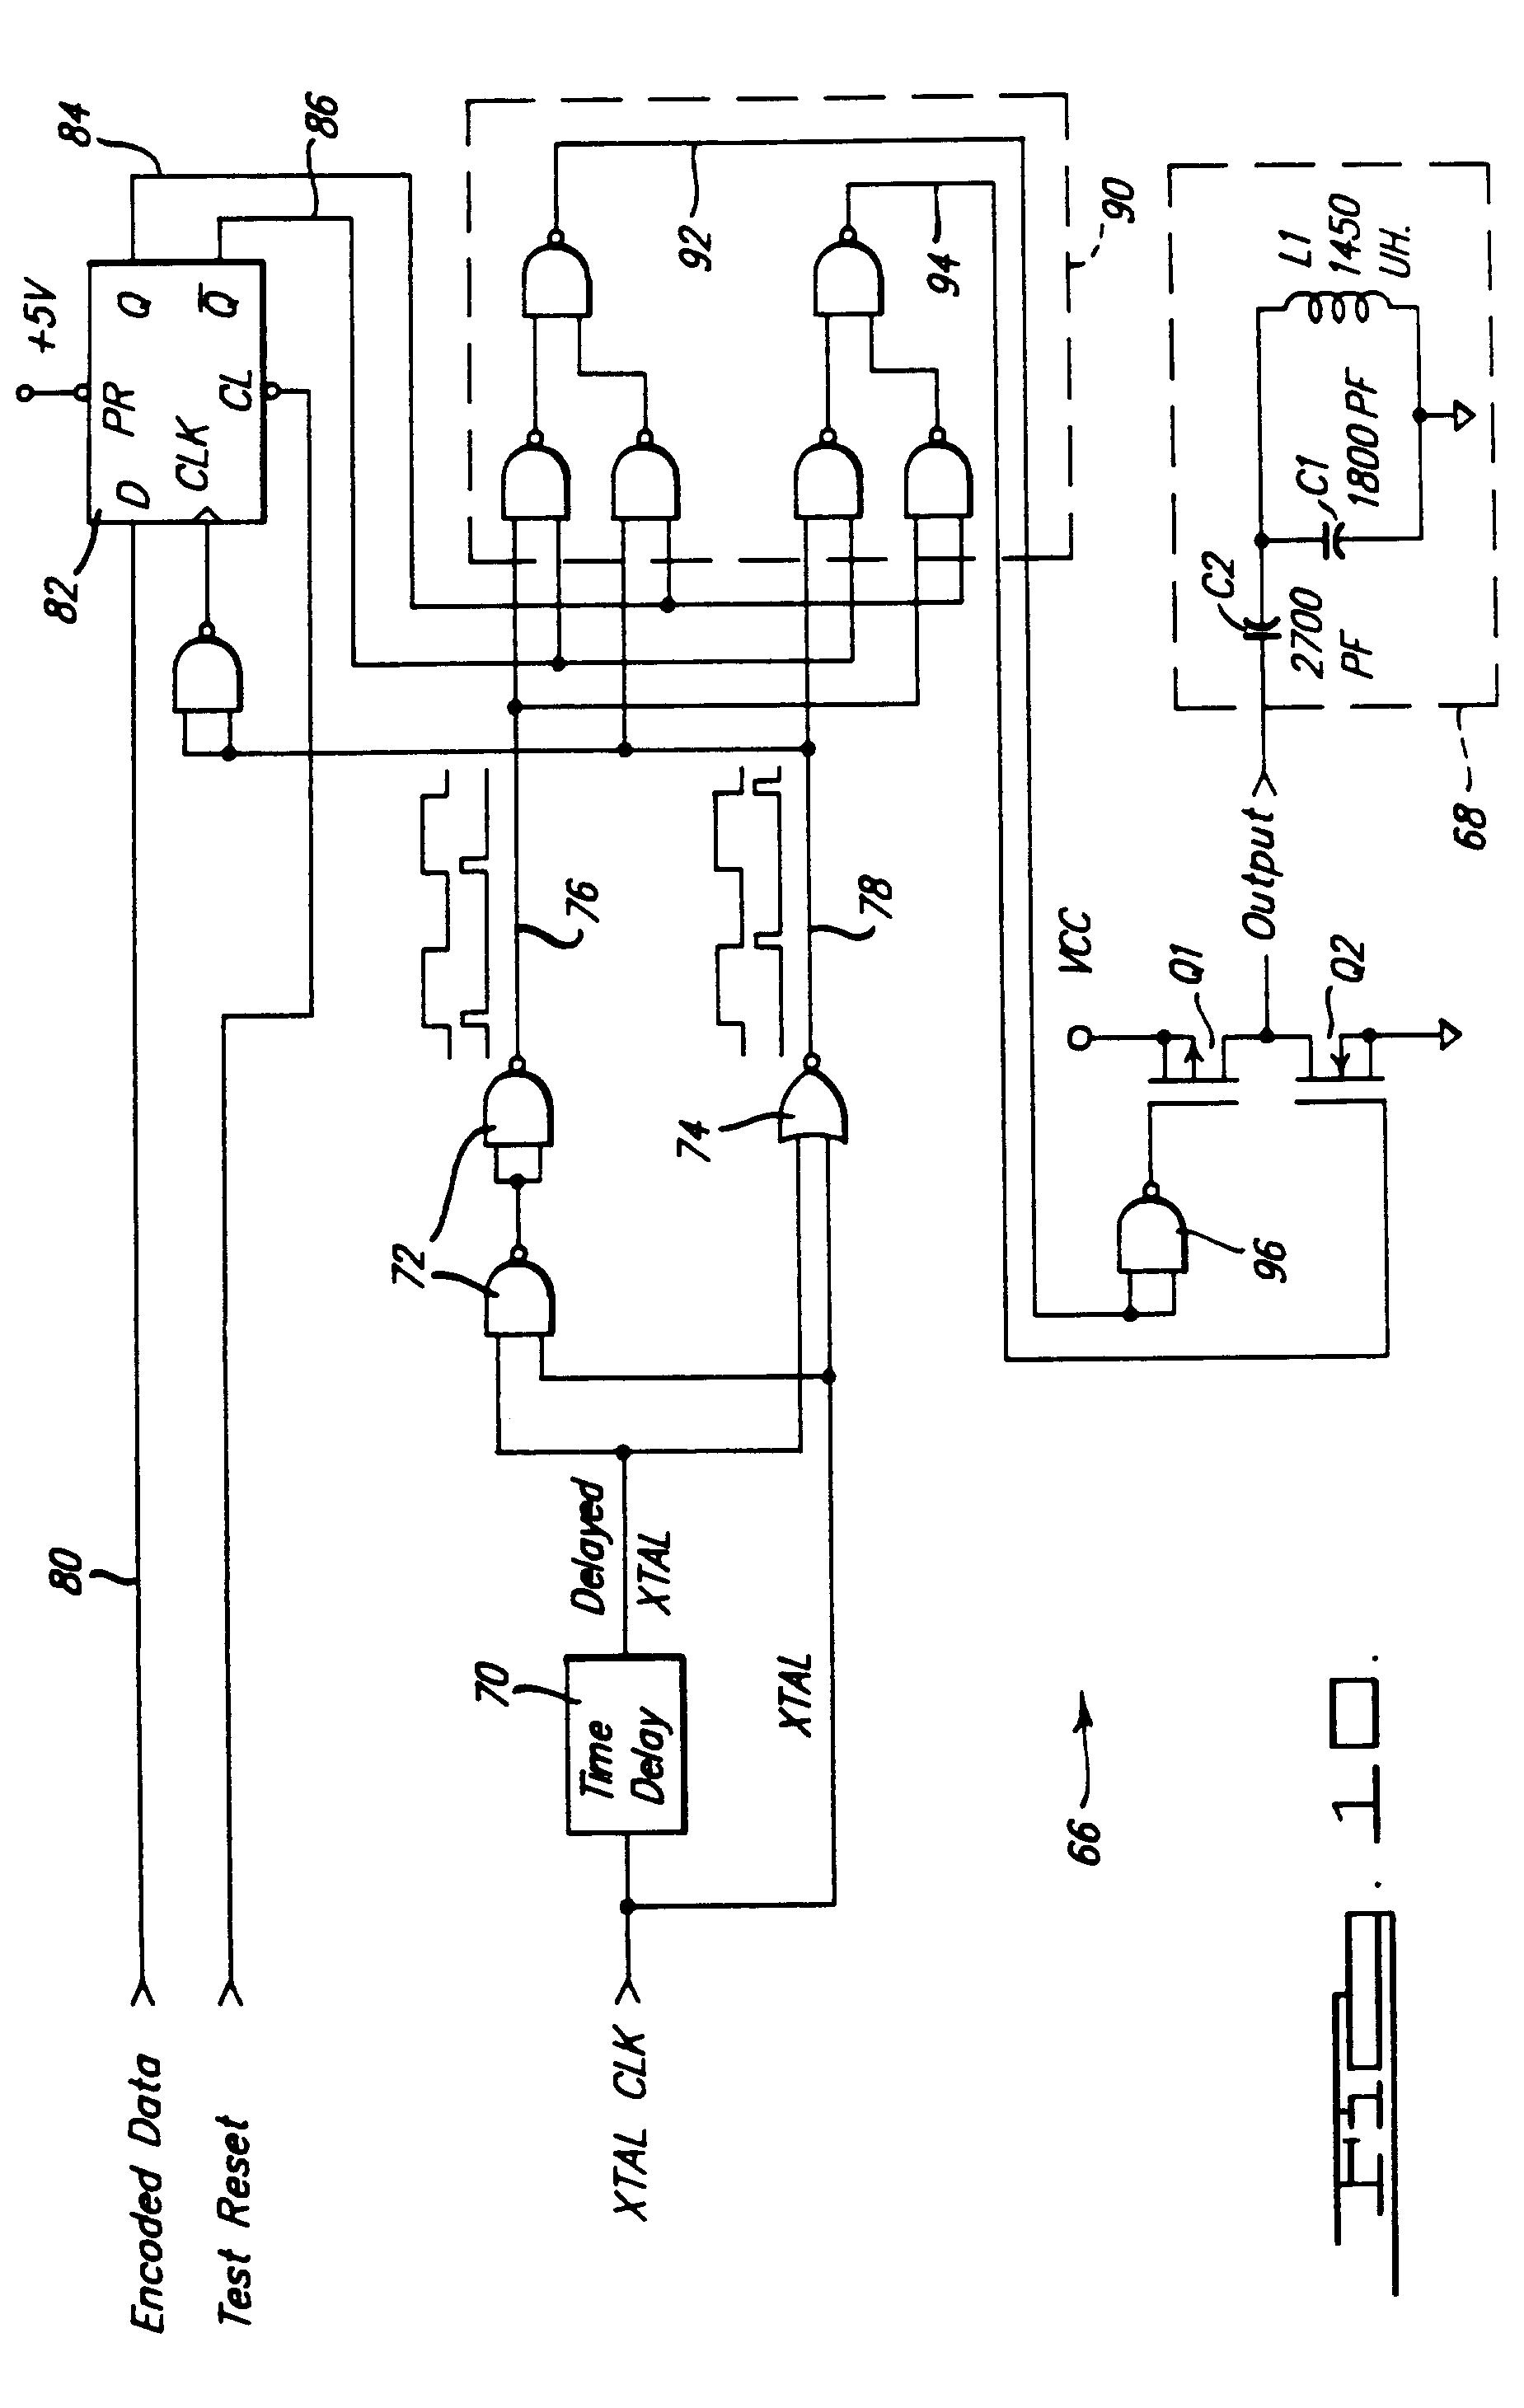 patent ep0343619b1 passives schl sselloses eingangssystem google patentsuche. Black Bedroom Furniture Sets. Home Design Ideas